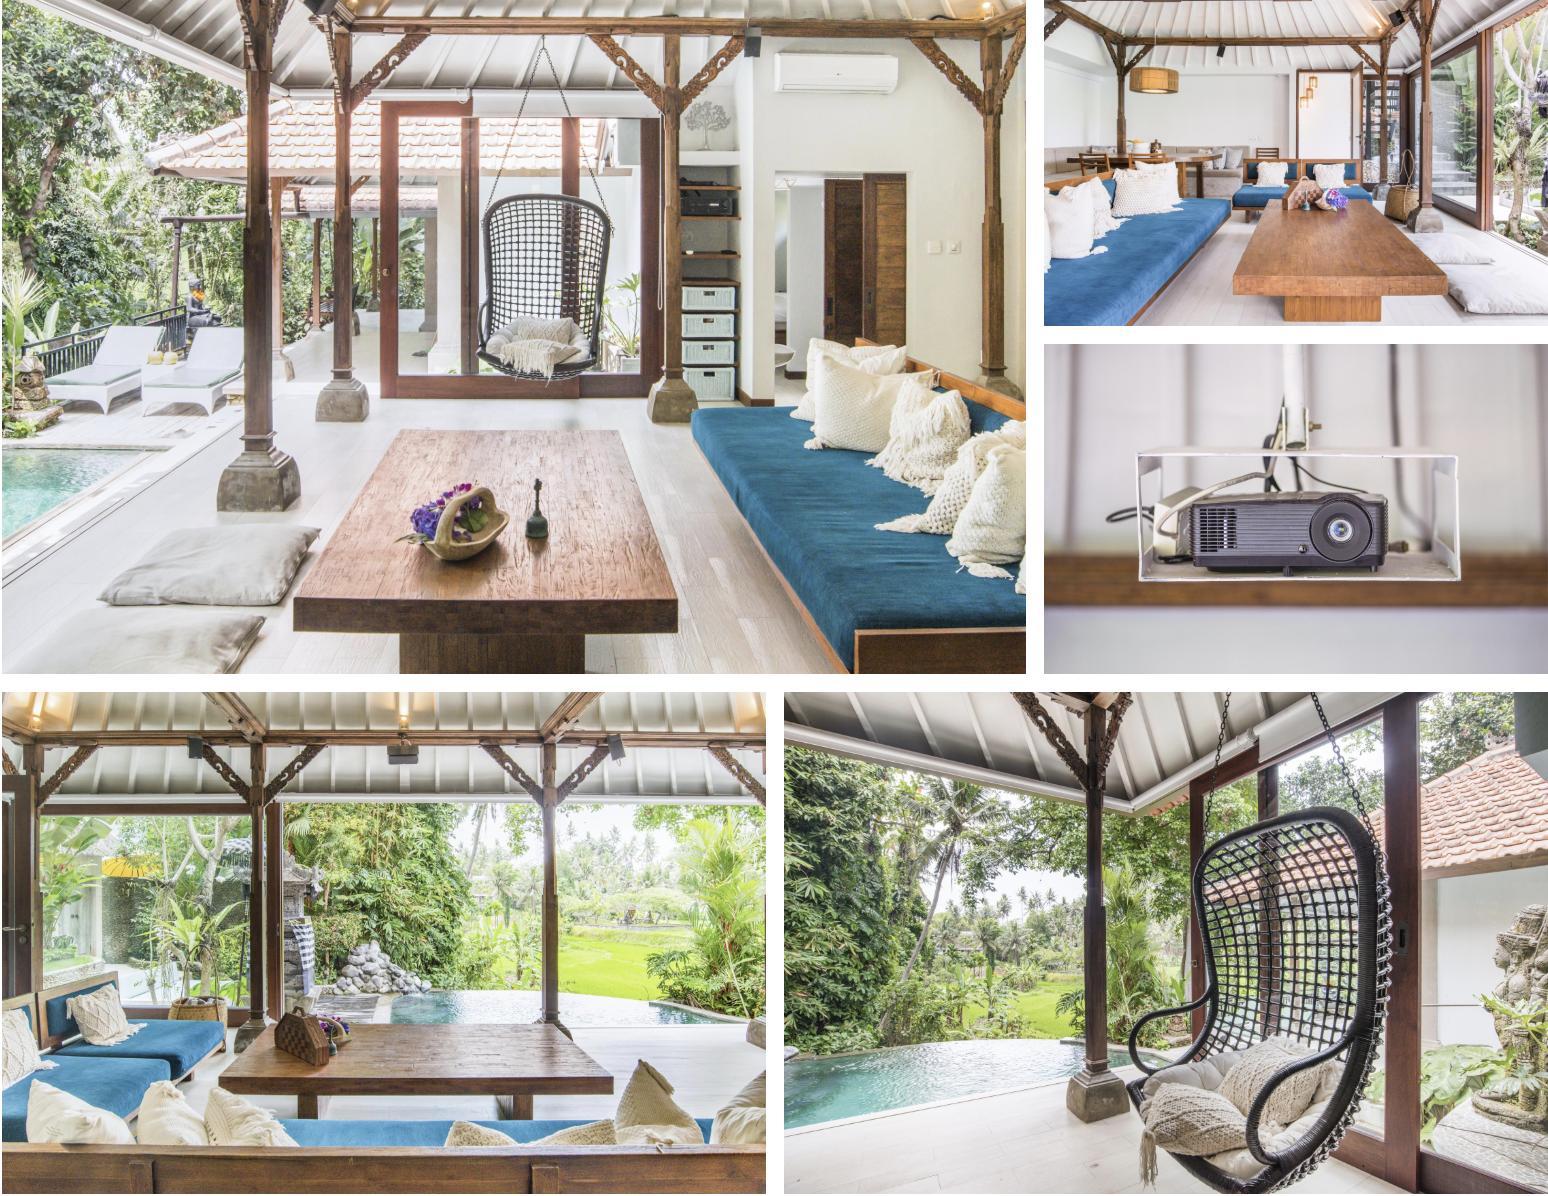 Relax and unwind in an Ubud Bali villa